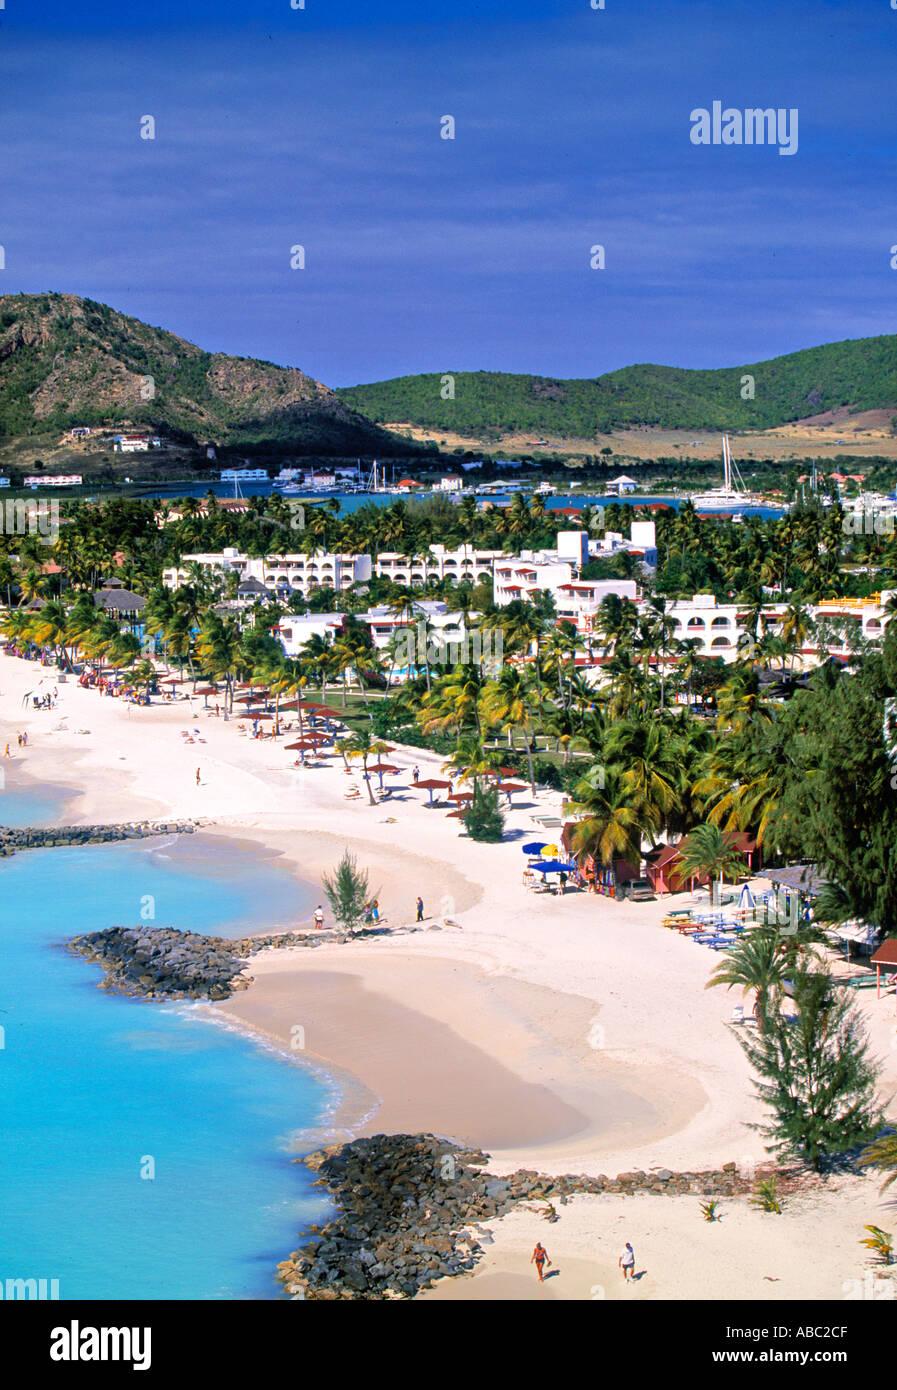 Jolly Harbour, Antigua, Caribbean - Stock Image